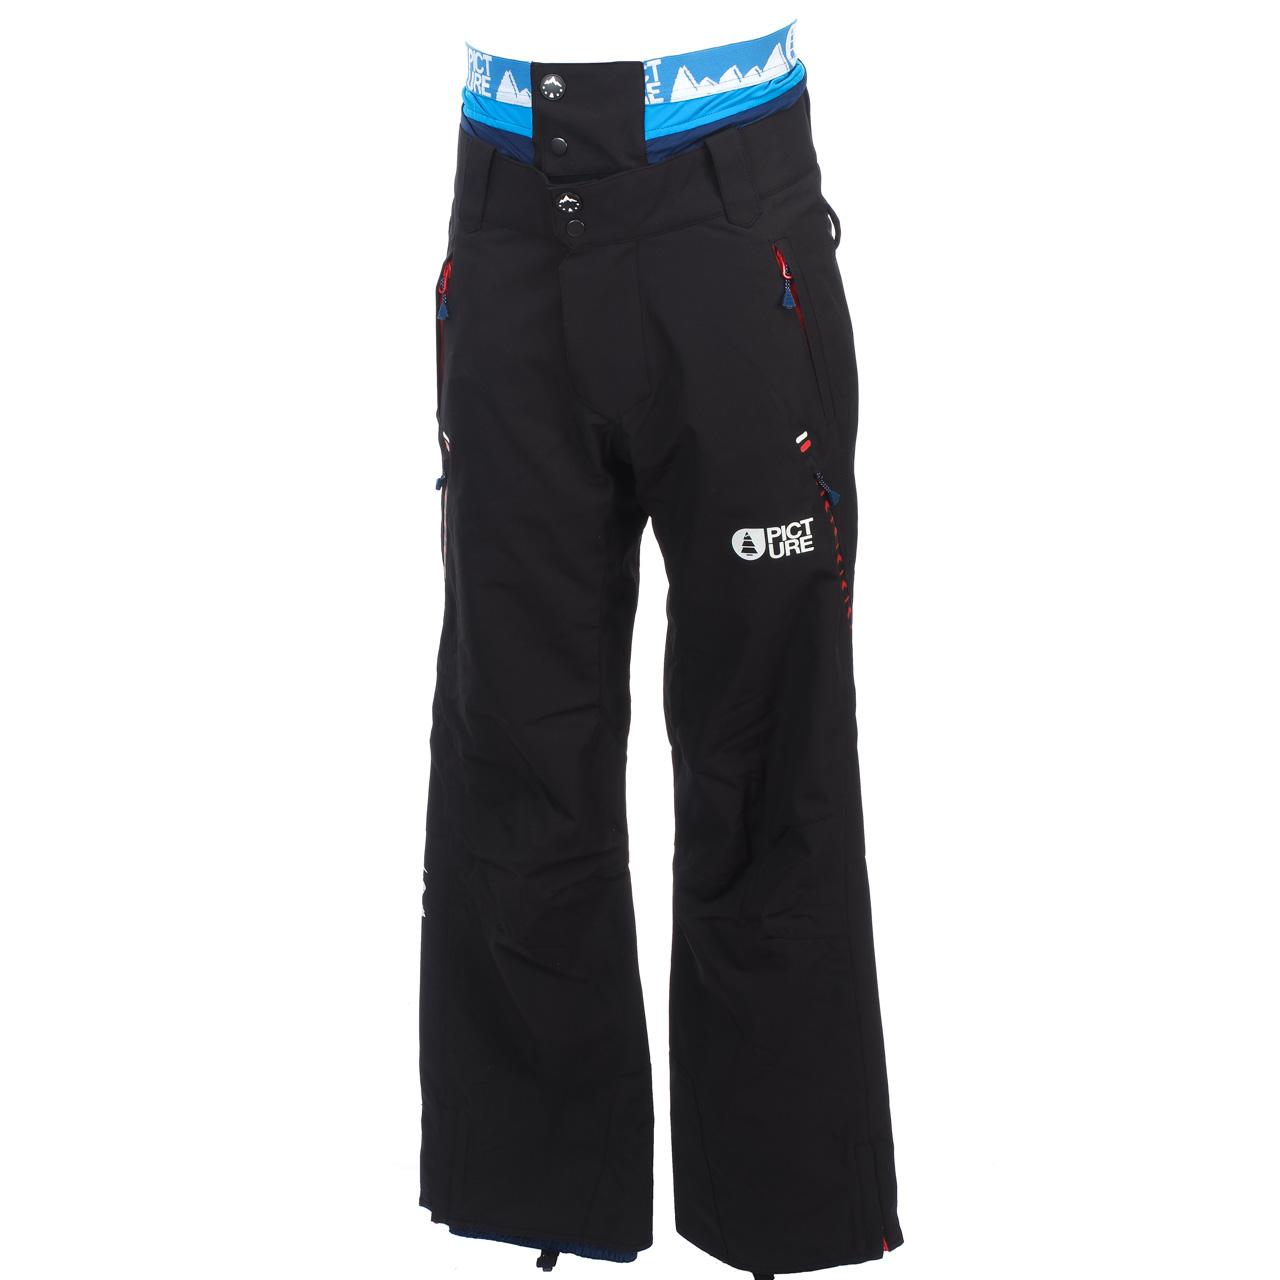 Pantalon-de-ski-surf-Picture-Base-blk-pant-fit-ski-Noir-67948-Neuf